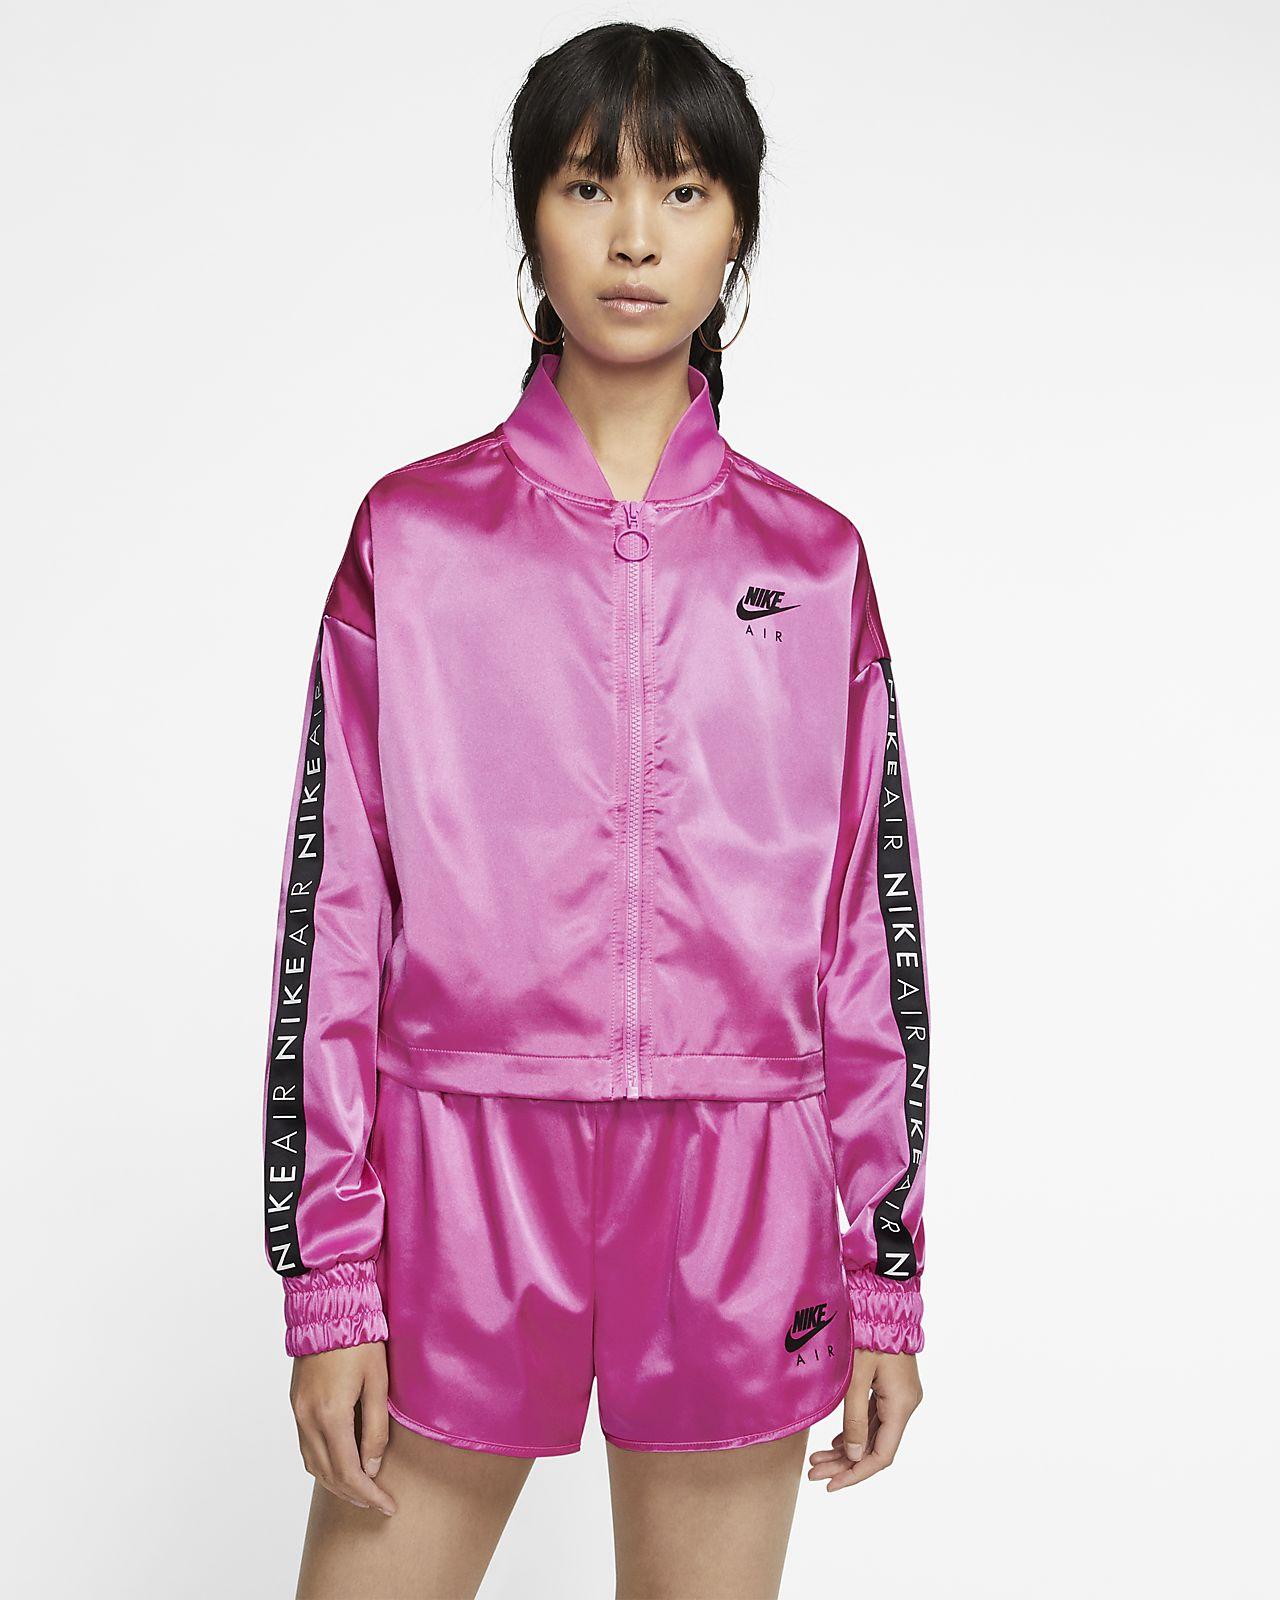 Nike Air Jaqueta de xandall setinada - Dona